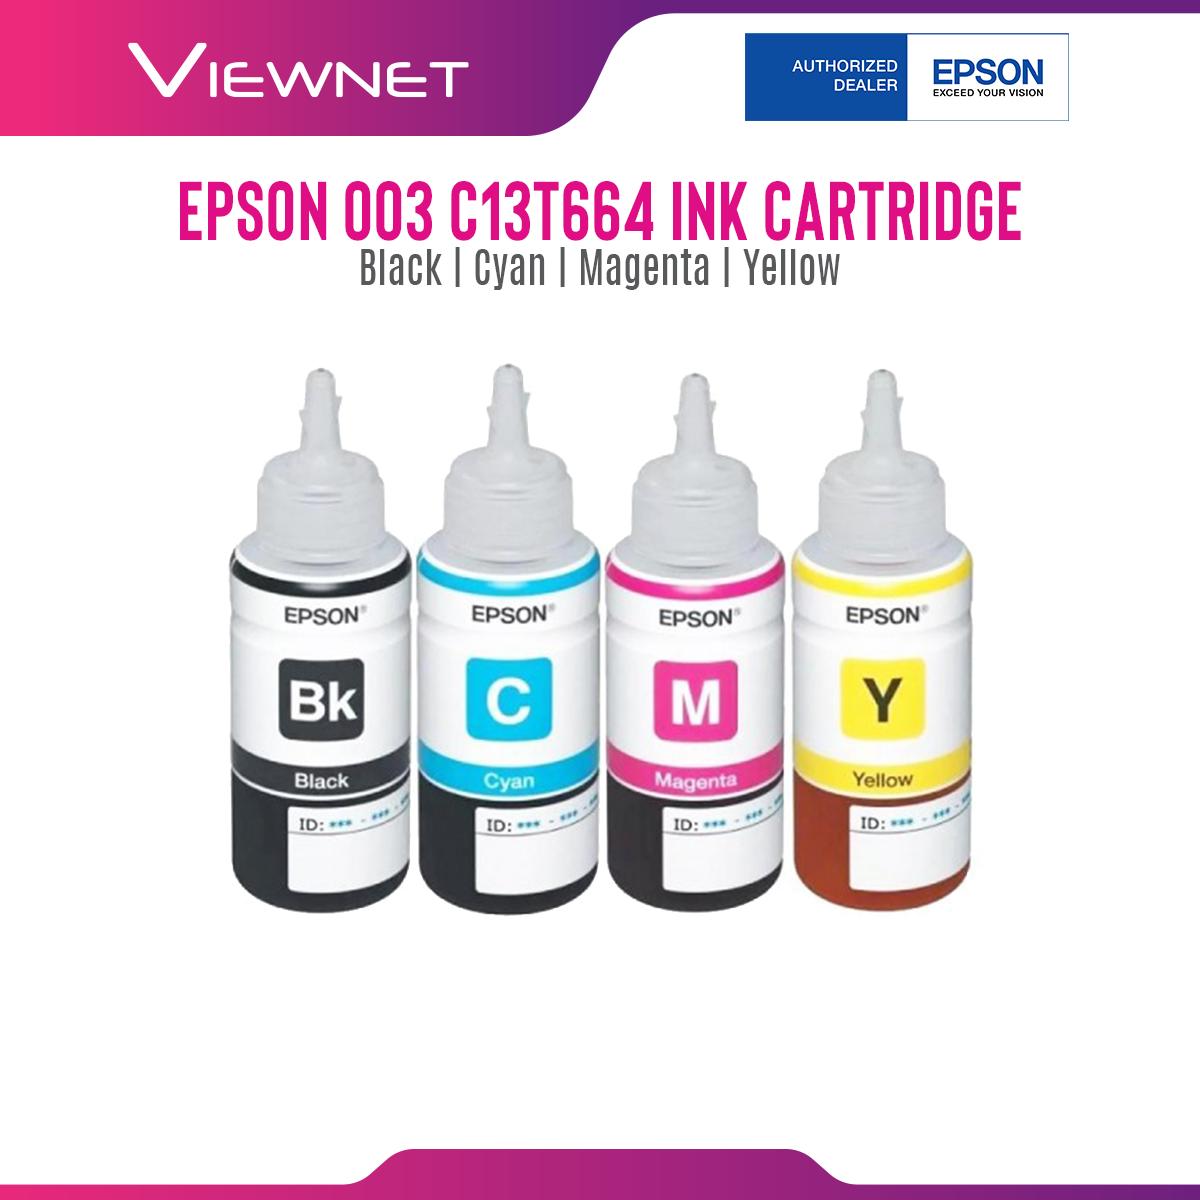 INK EPSON CARTRIDGE C13T664 CISS (BLK/CYAN/MAGENTA/YELLOW)